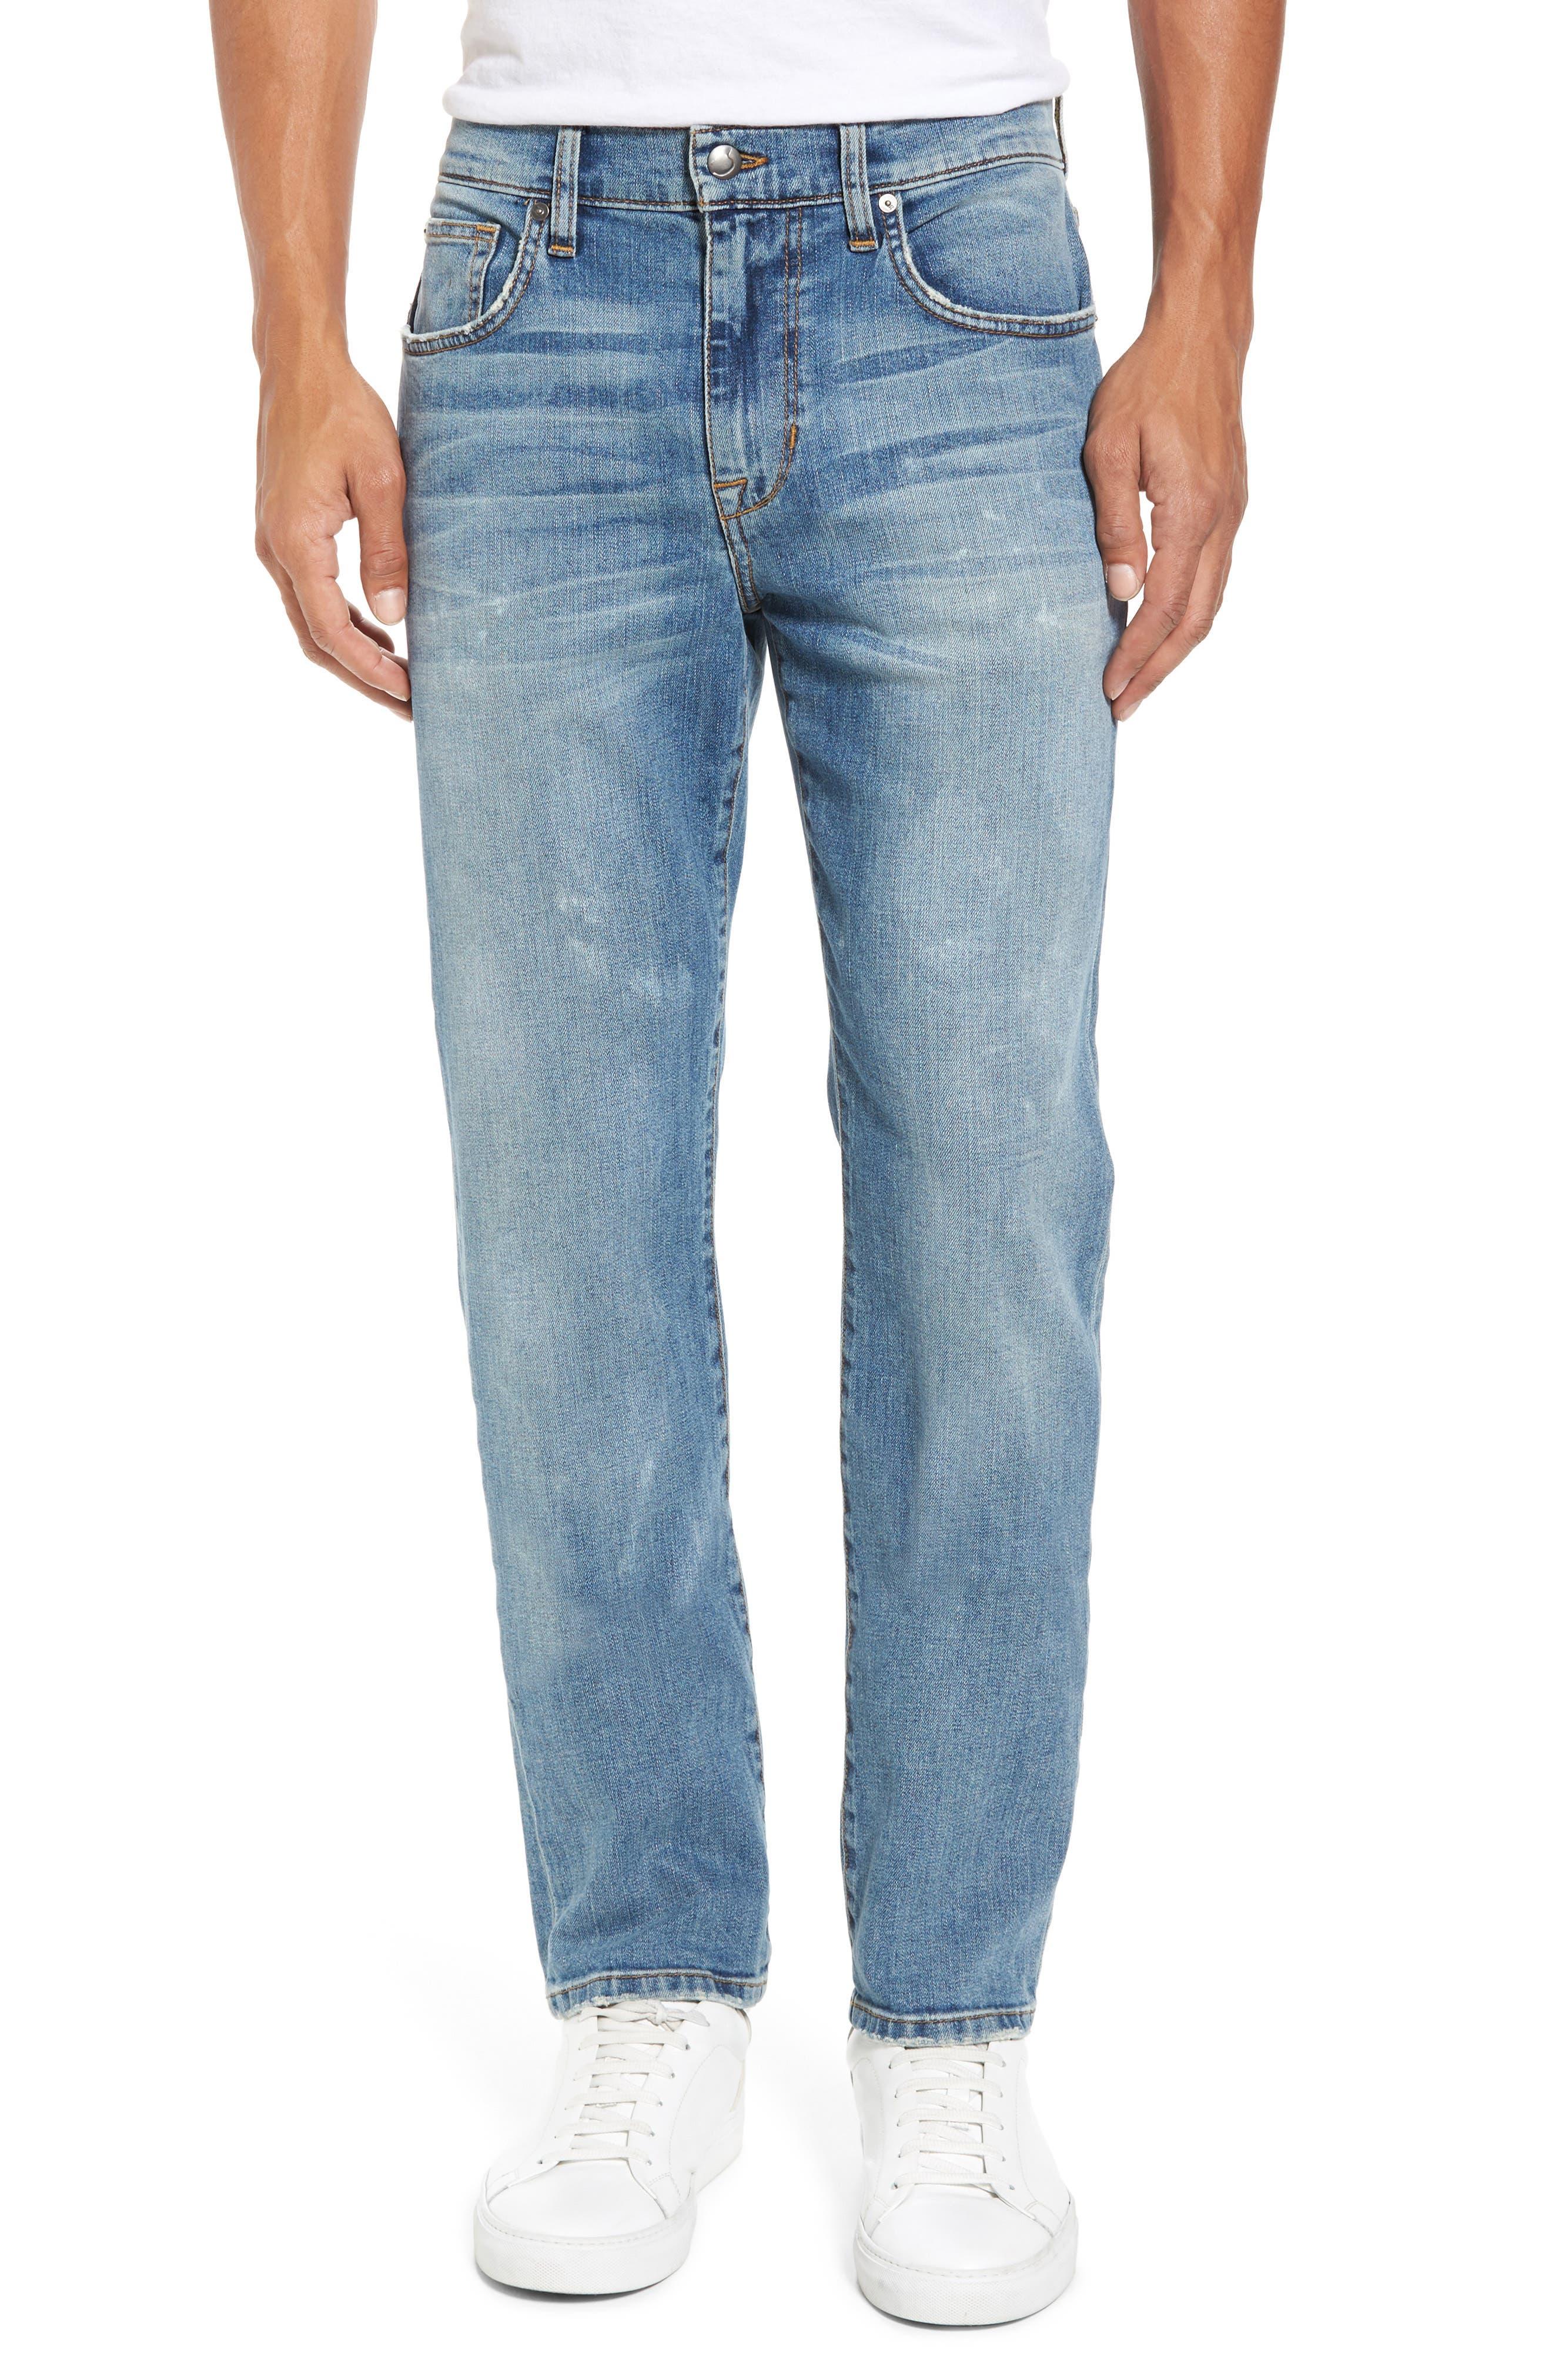 Brixton Slim Straight Fit Jeans,                             Main thumbnail 1, color,                             Wyman